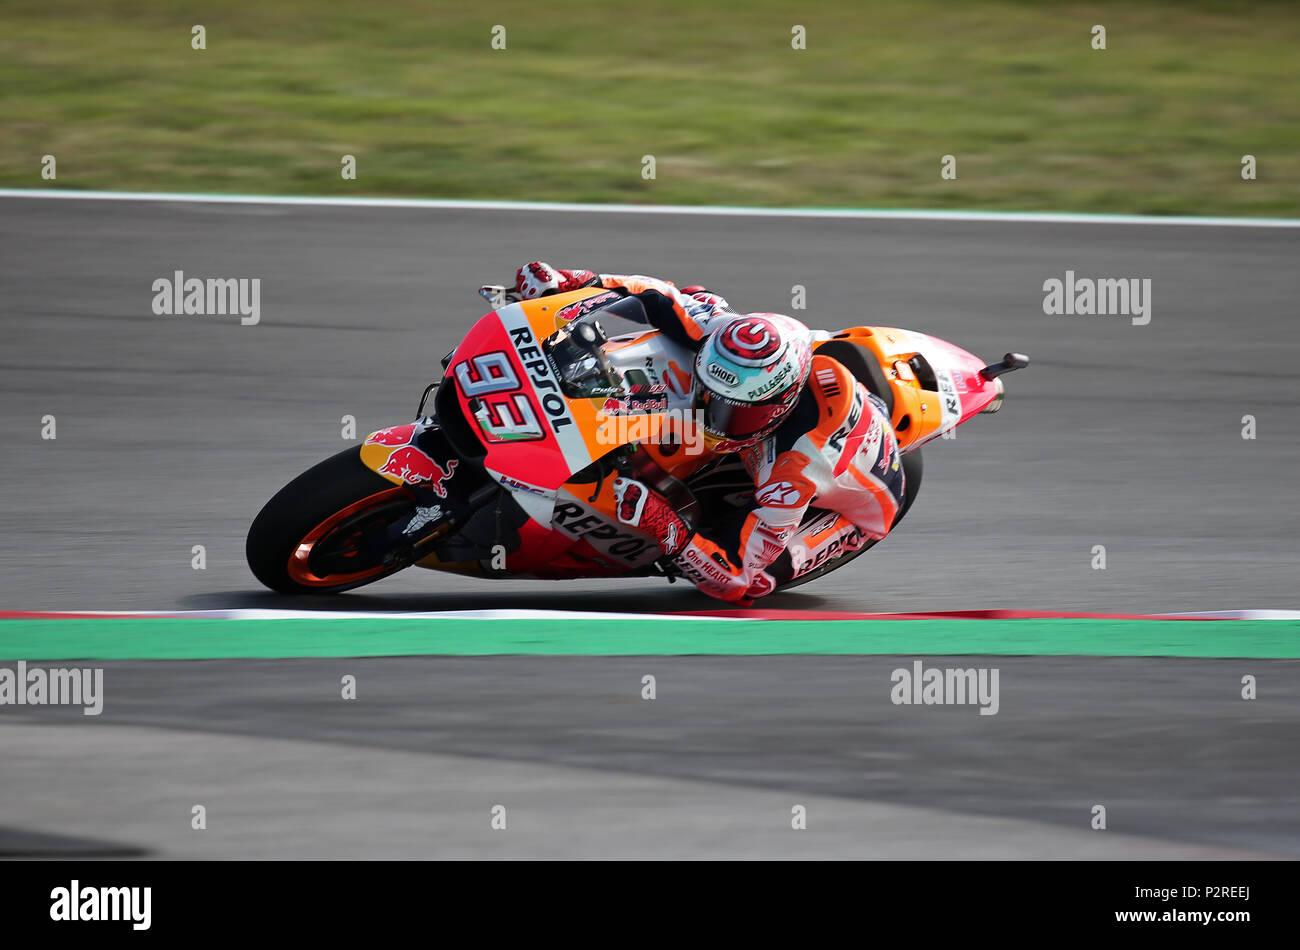 Barcelona -16th June 2018- SPAIN: Marc Marquez (Honda) during the free practice of the GP Catalunya Moto GP, in the Barcelona-Catalunya Circuit, on 16th June 2018. Photo: Joan Valls/Urbanandsport/Cordon Press - Stock Image